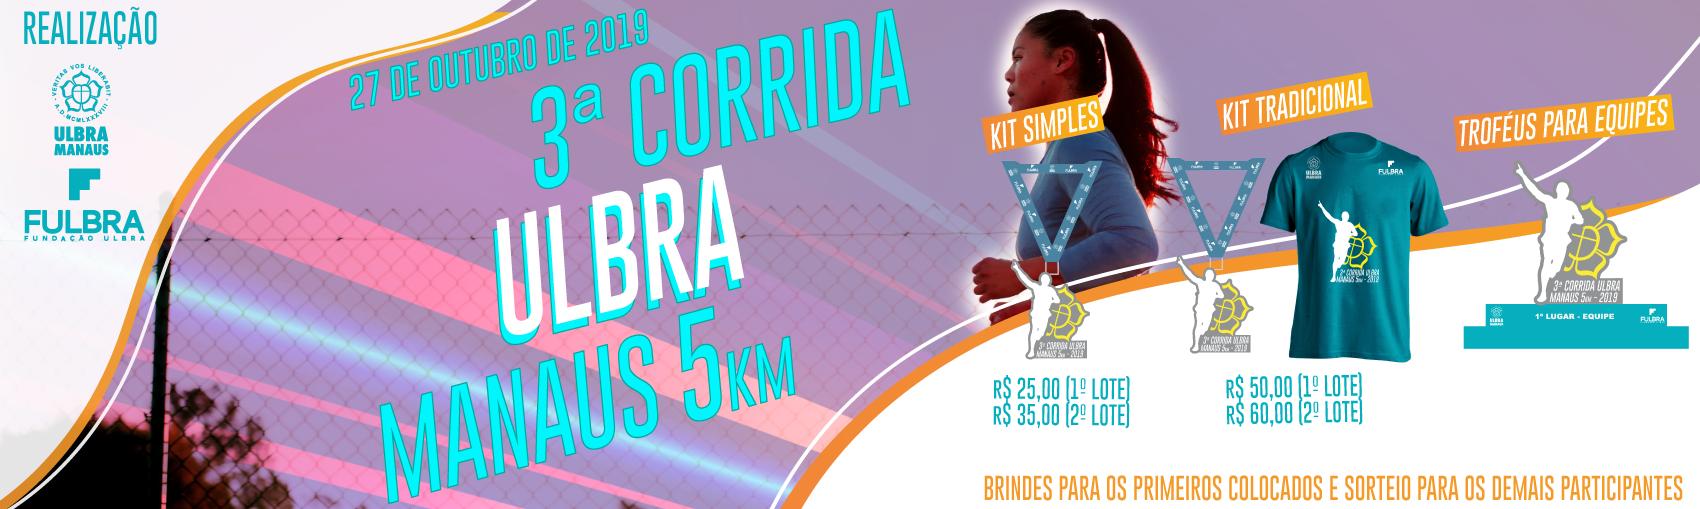 III CORRIDA ULBRA MANAUS - 2019